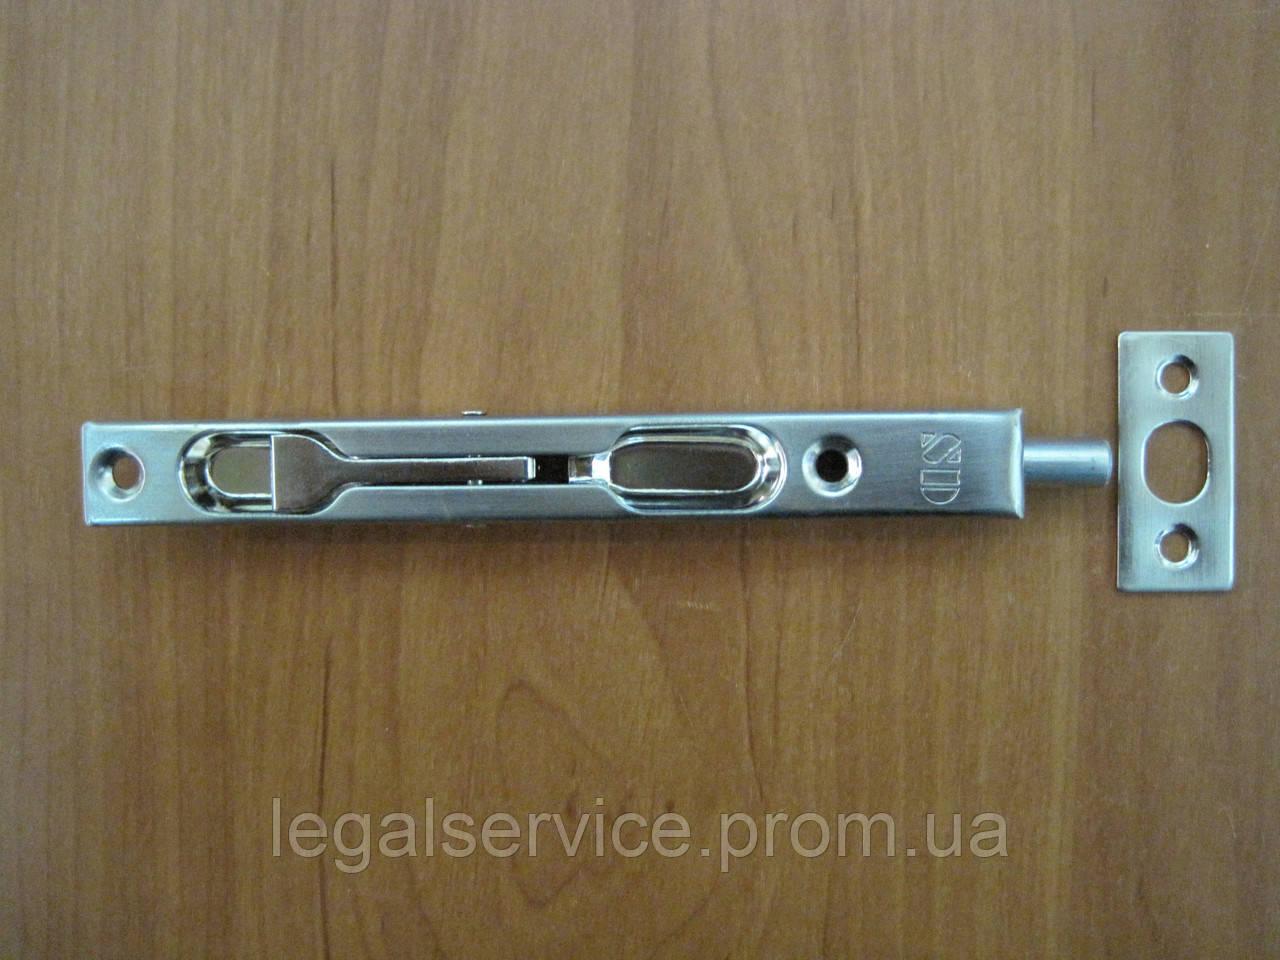 Шпингалет для межкомнатных дверей (двухстворчатые) LX 140мм